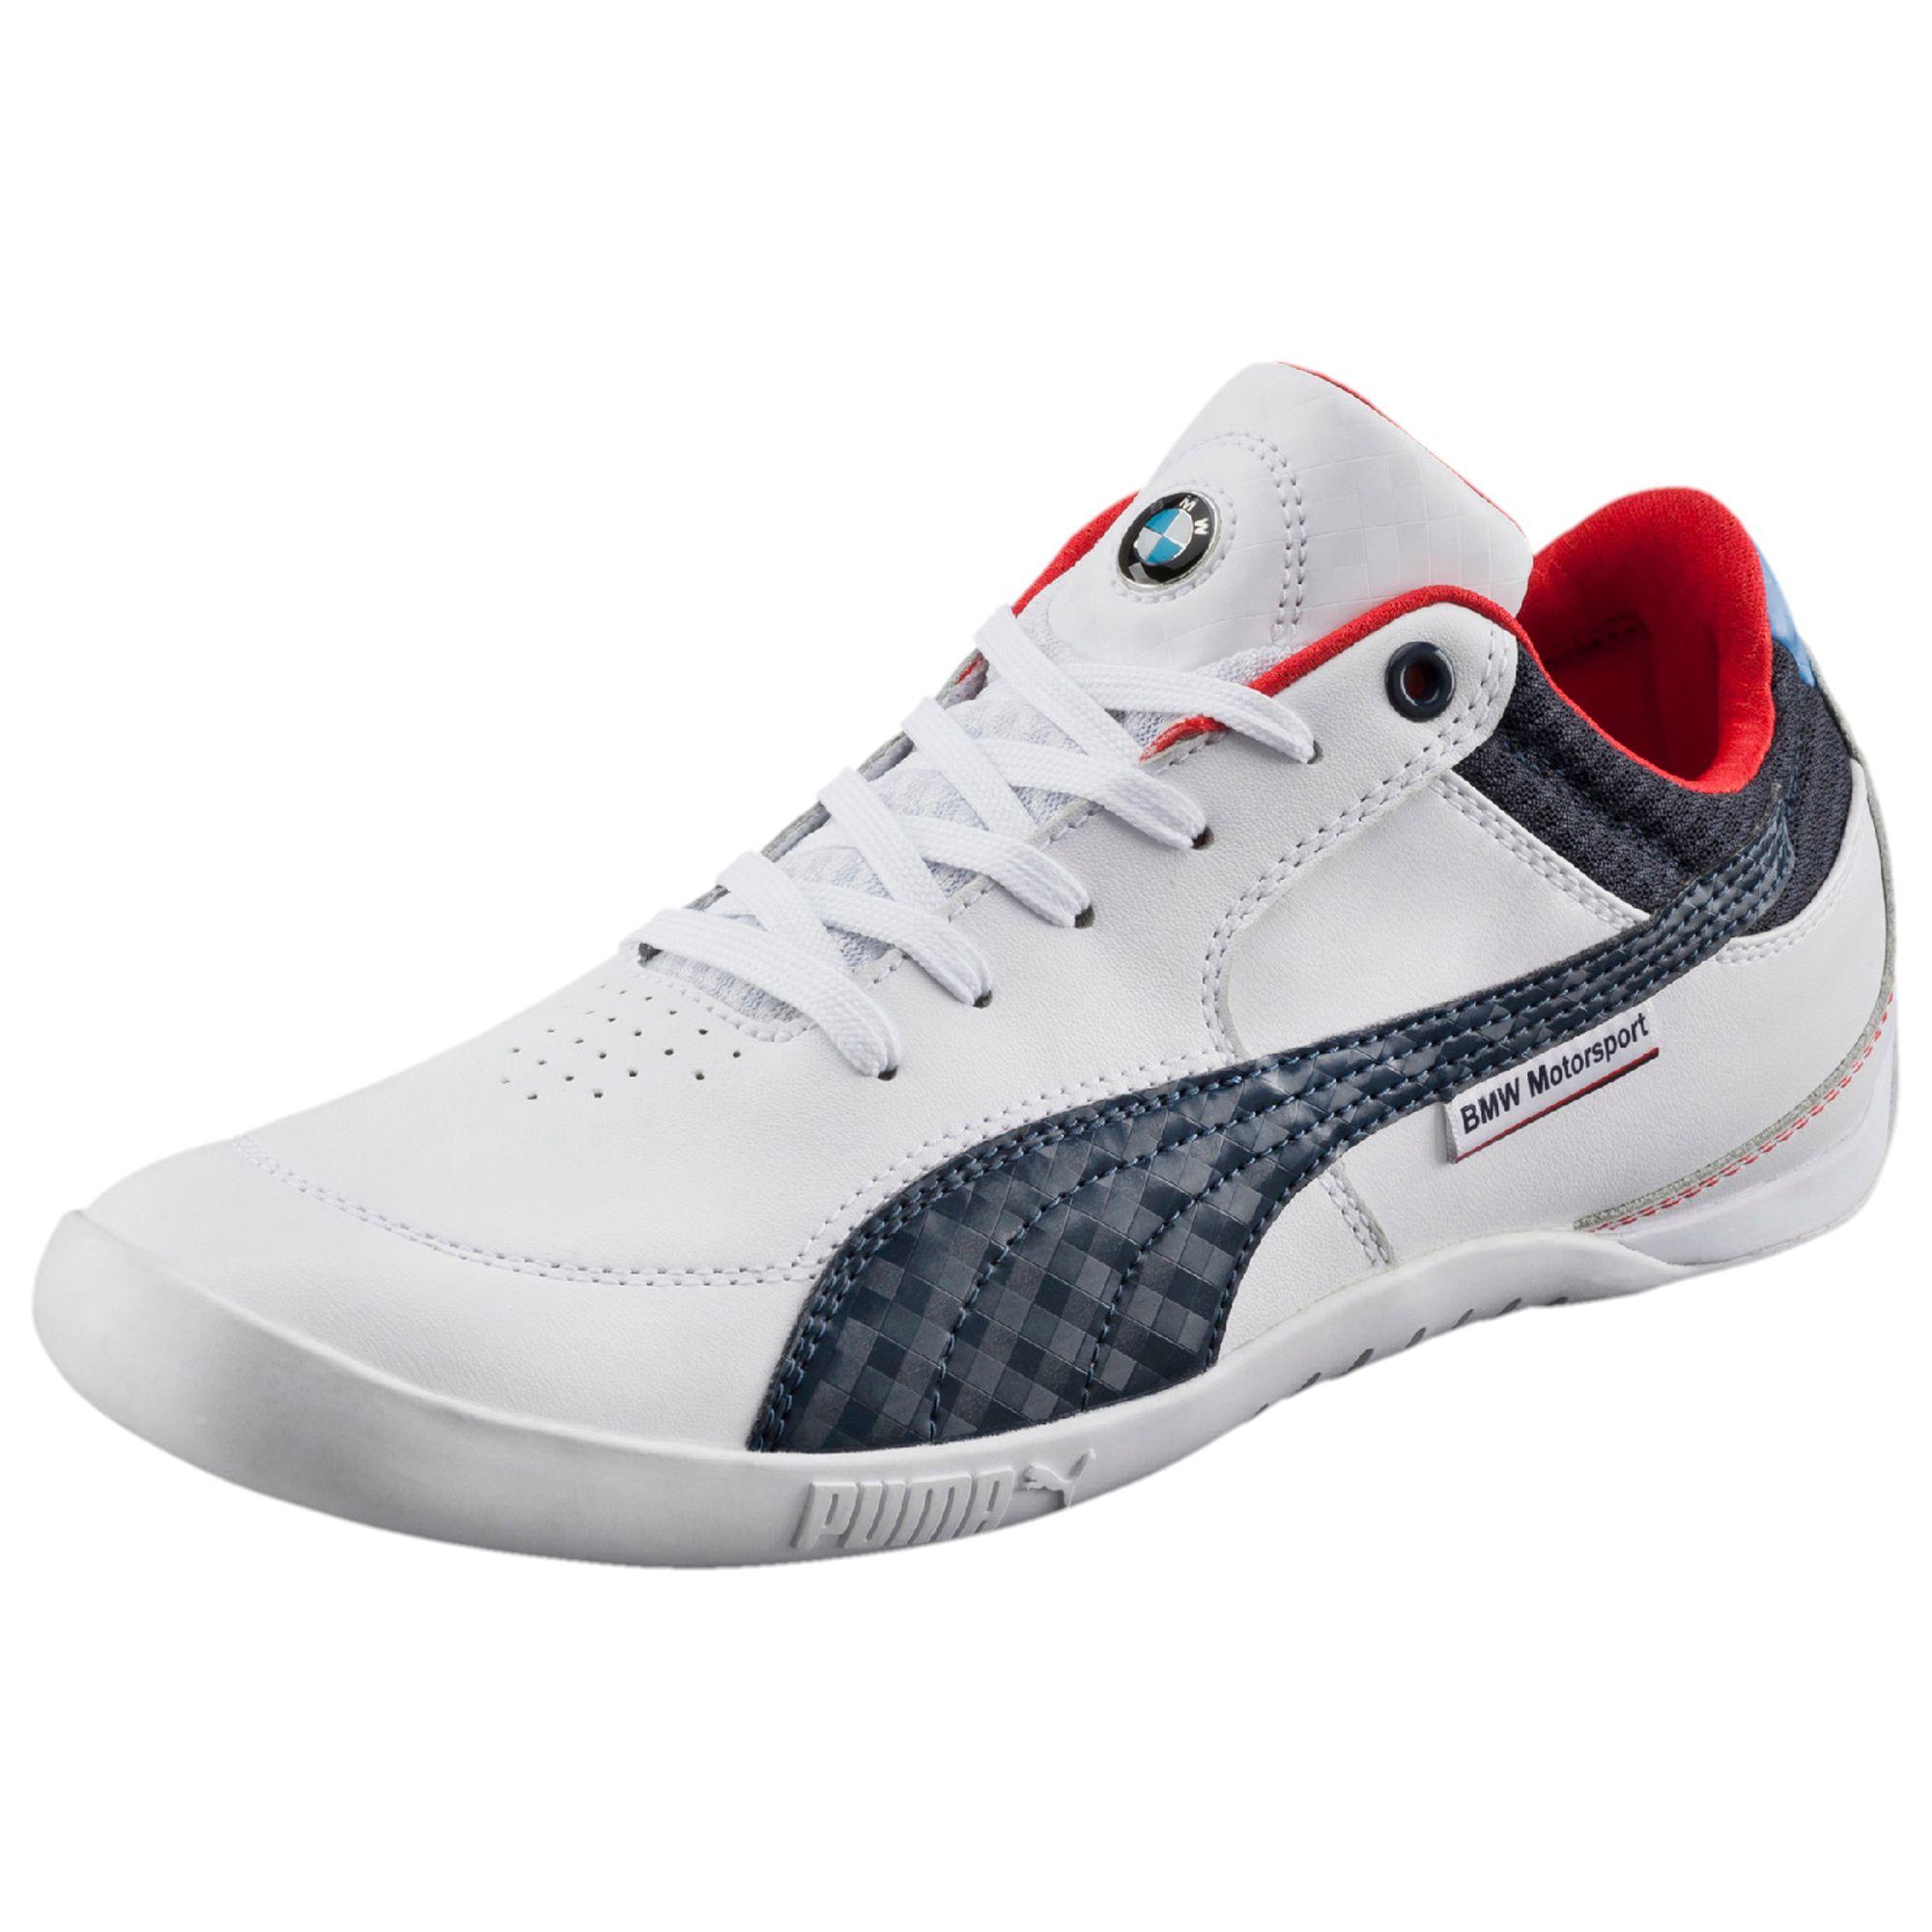 Puma Bmw Chrono Delta Nm Lo Men S Shoes In Blue For Men Lyst